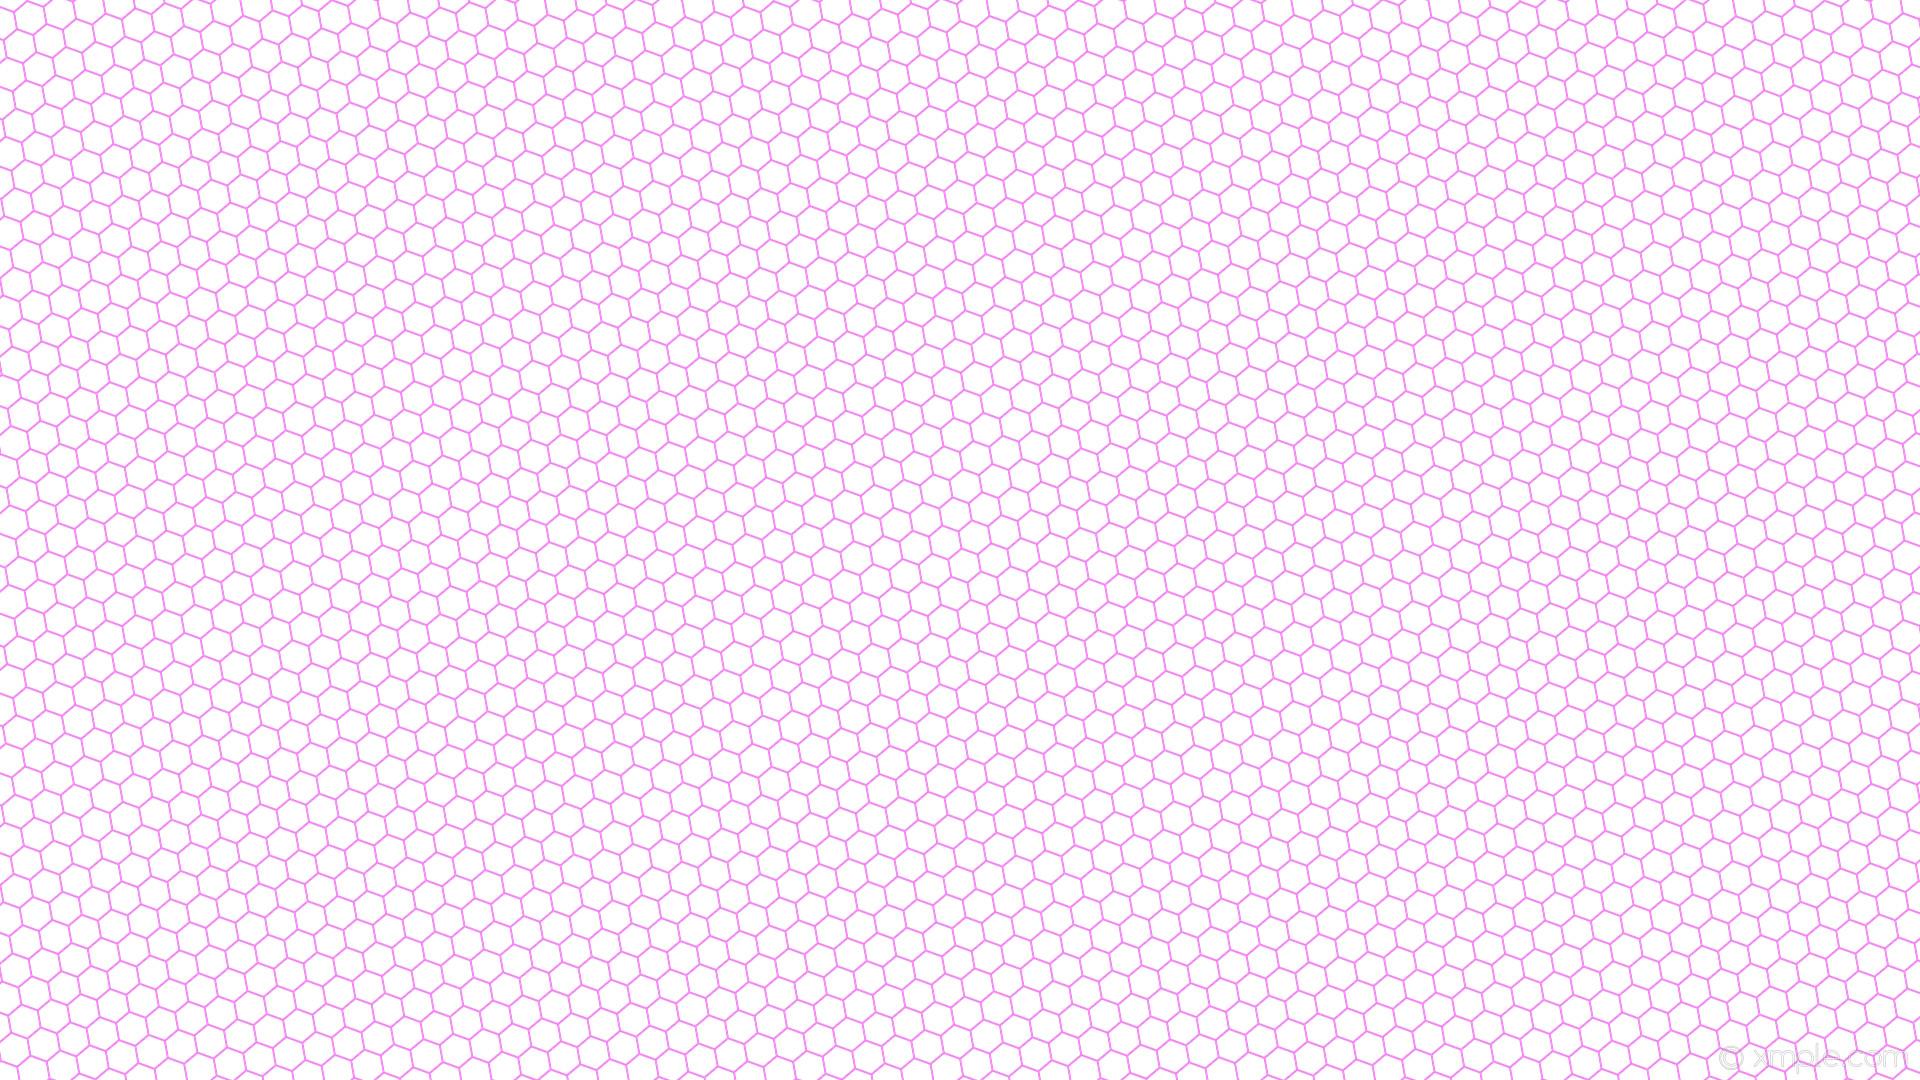 wallpaper beehive white hexagon honeycomb purple violet #ffffff #ee82ee  diagonal 10° 2px 30px